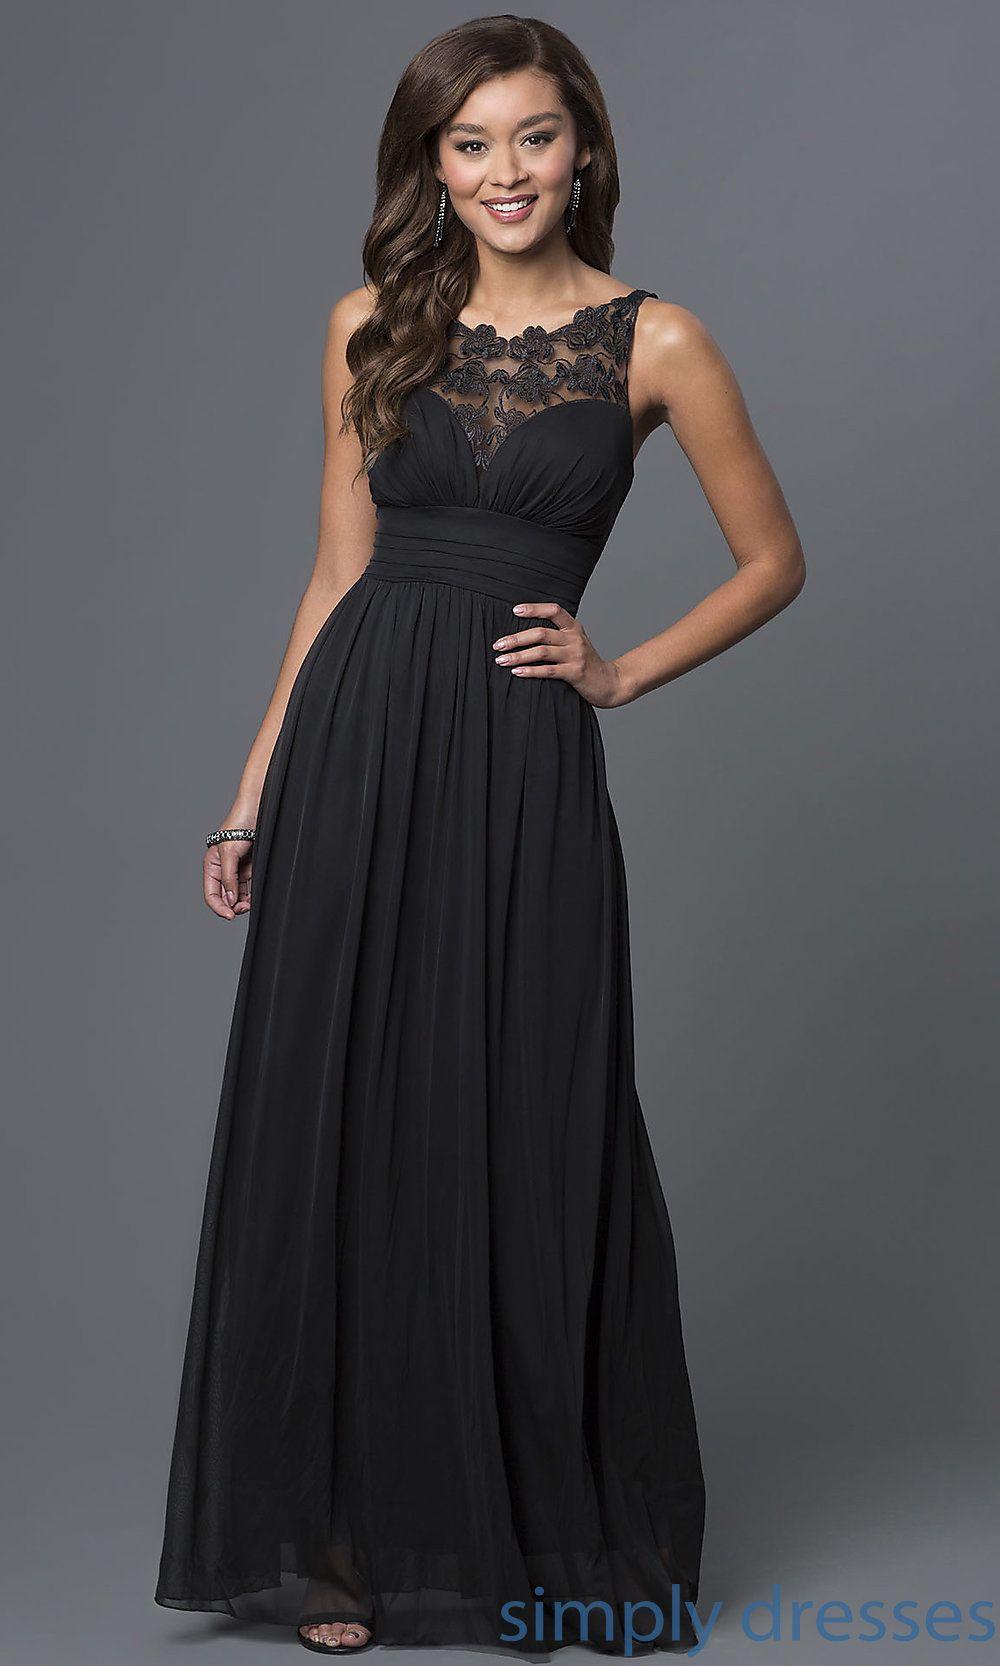 Long illusionlace sleeveless formal dress dress formal dress